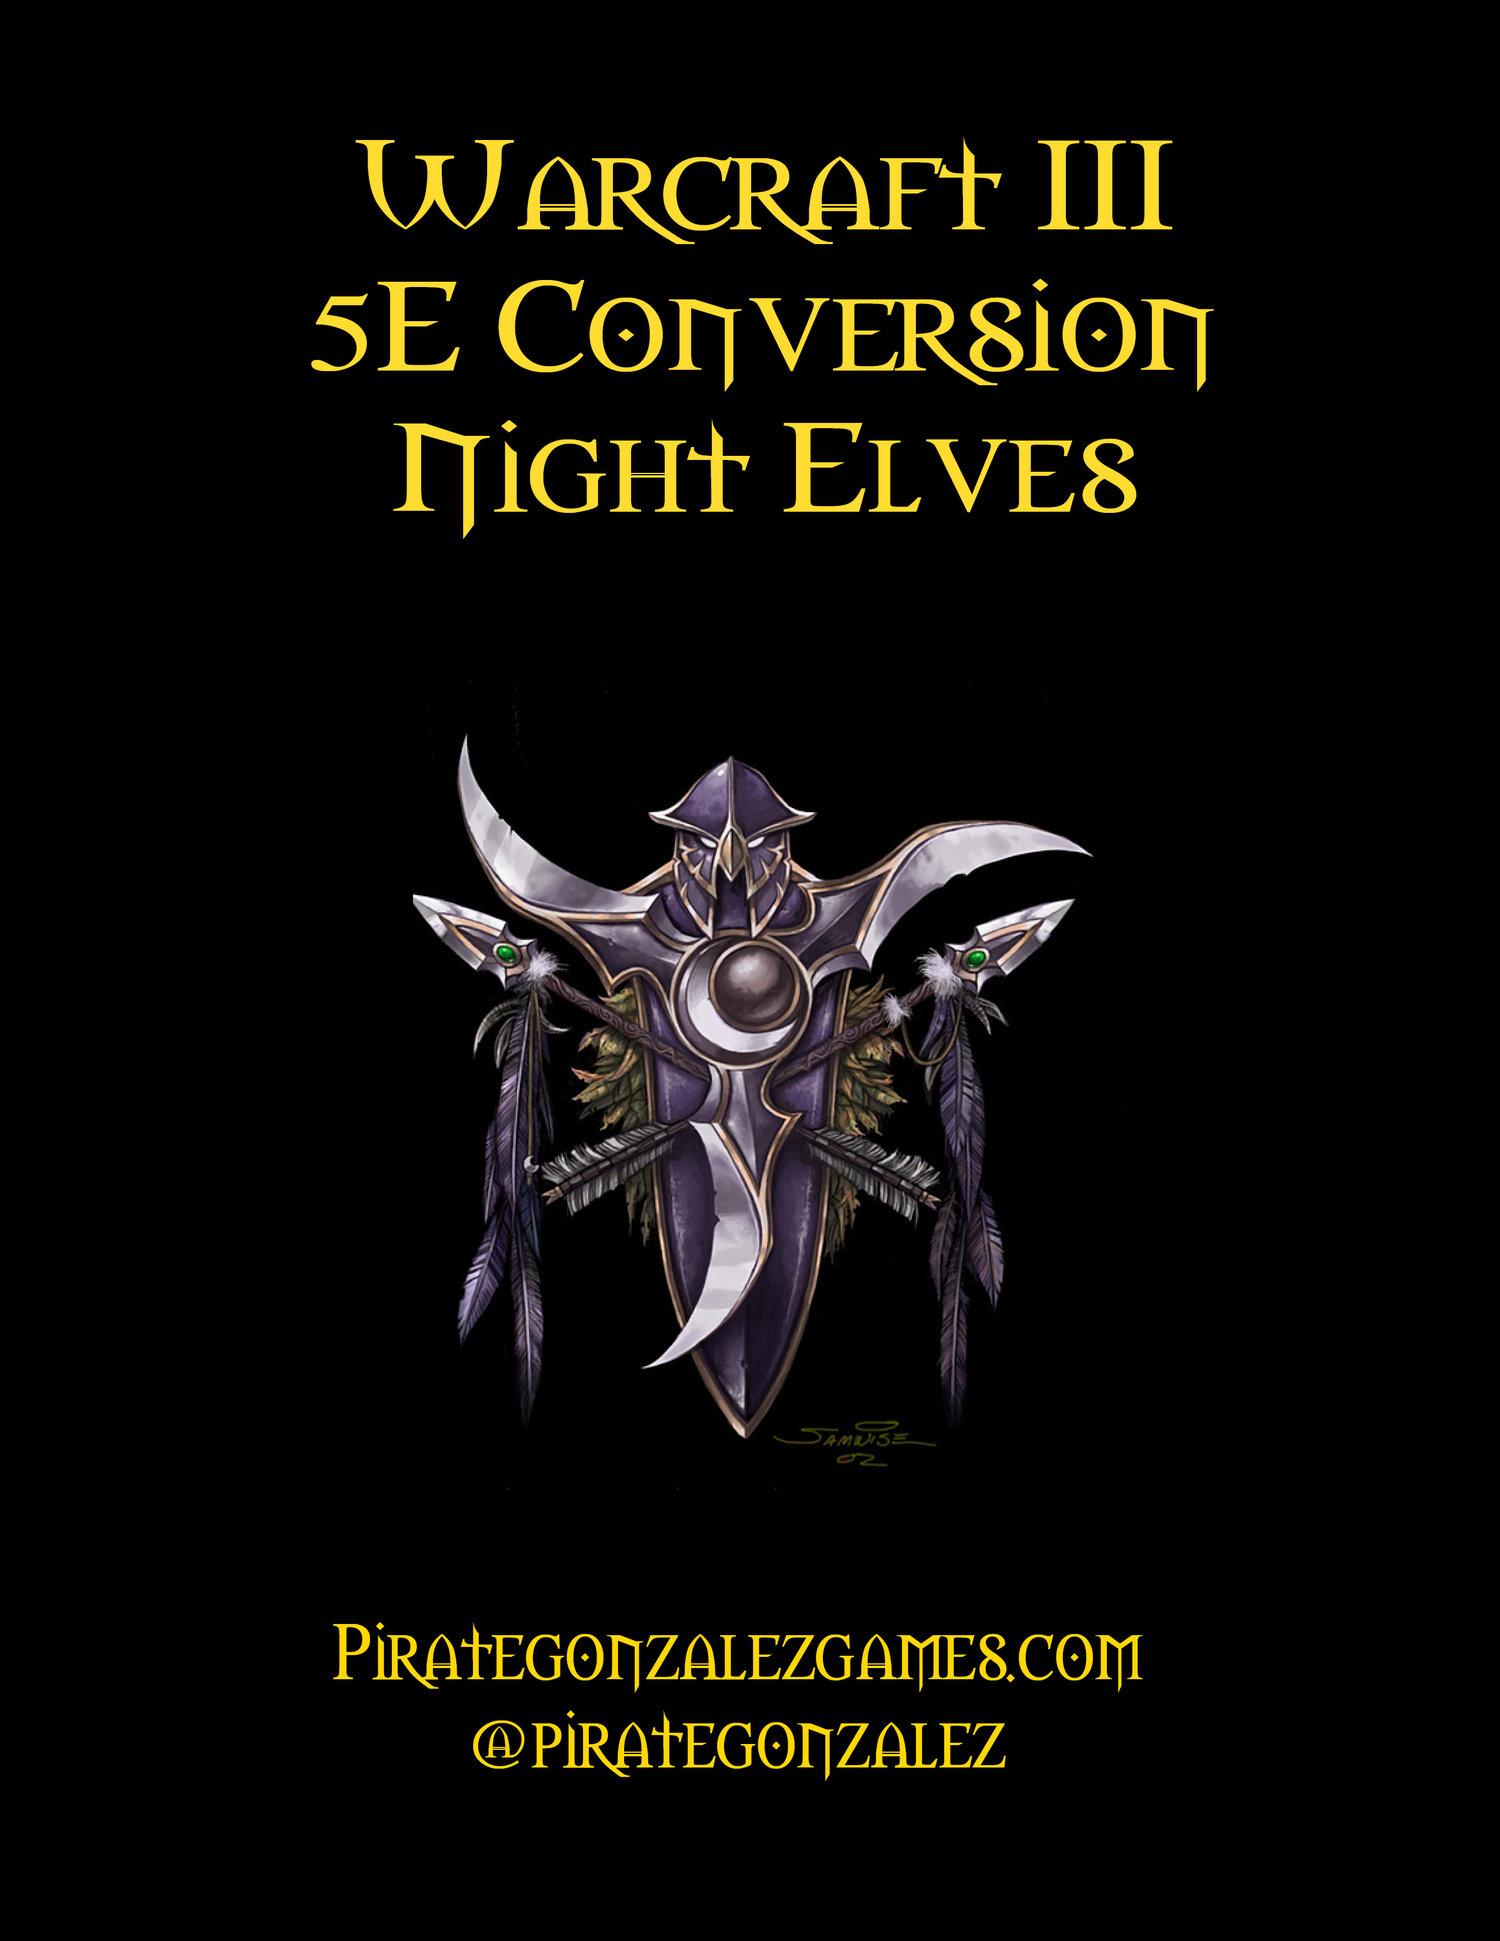 Warcraft III Conversion: Night Elves — Pirate Gonzalez Games